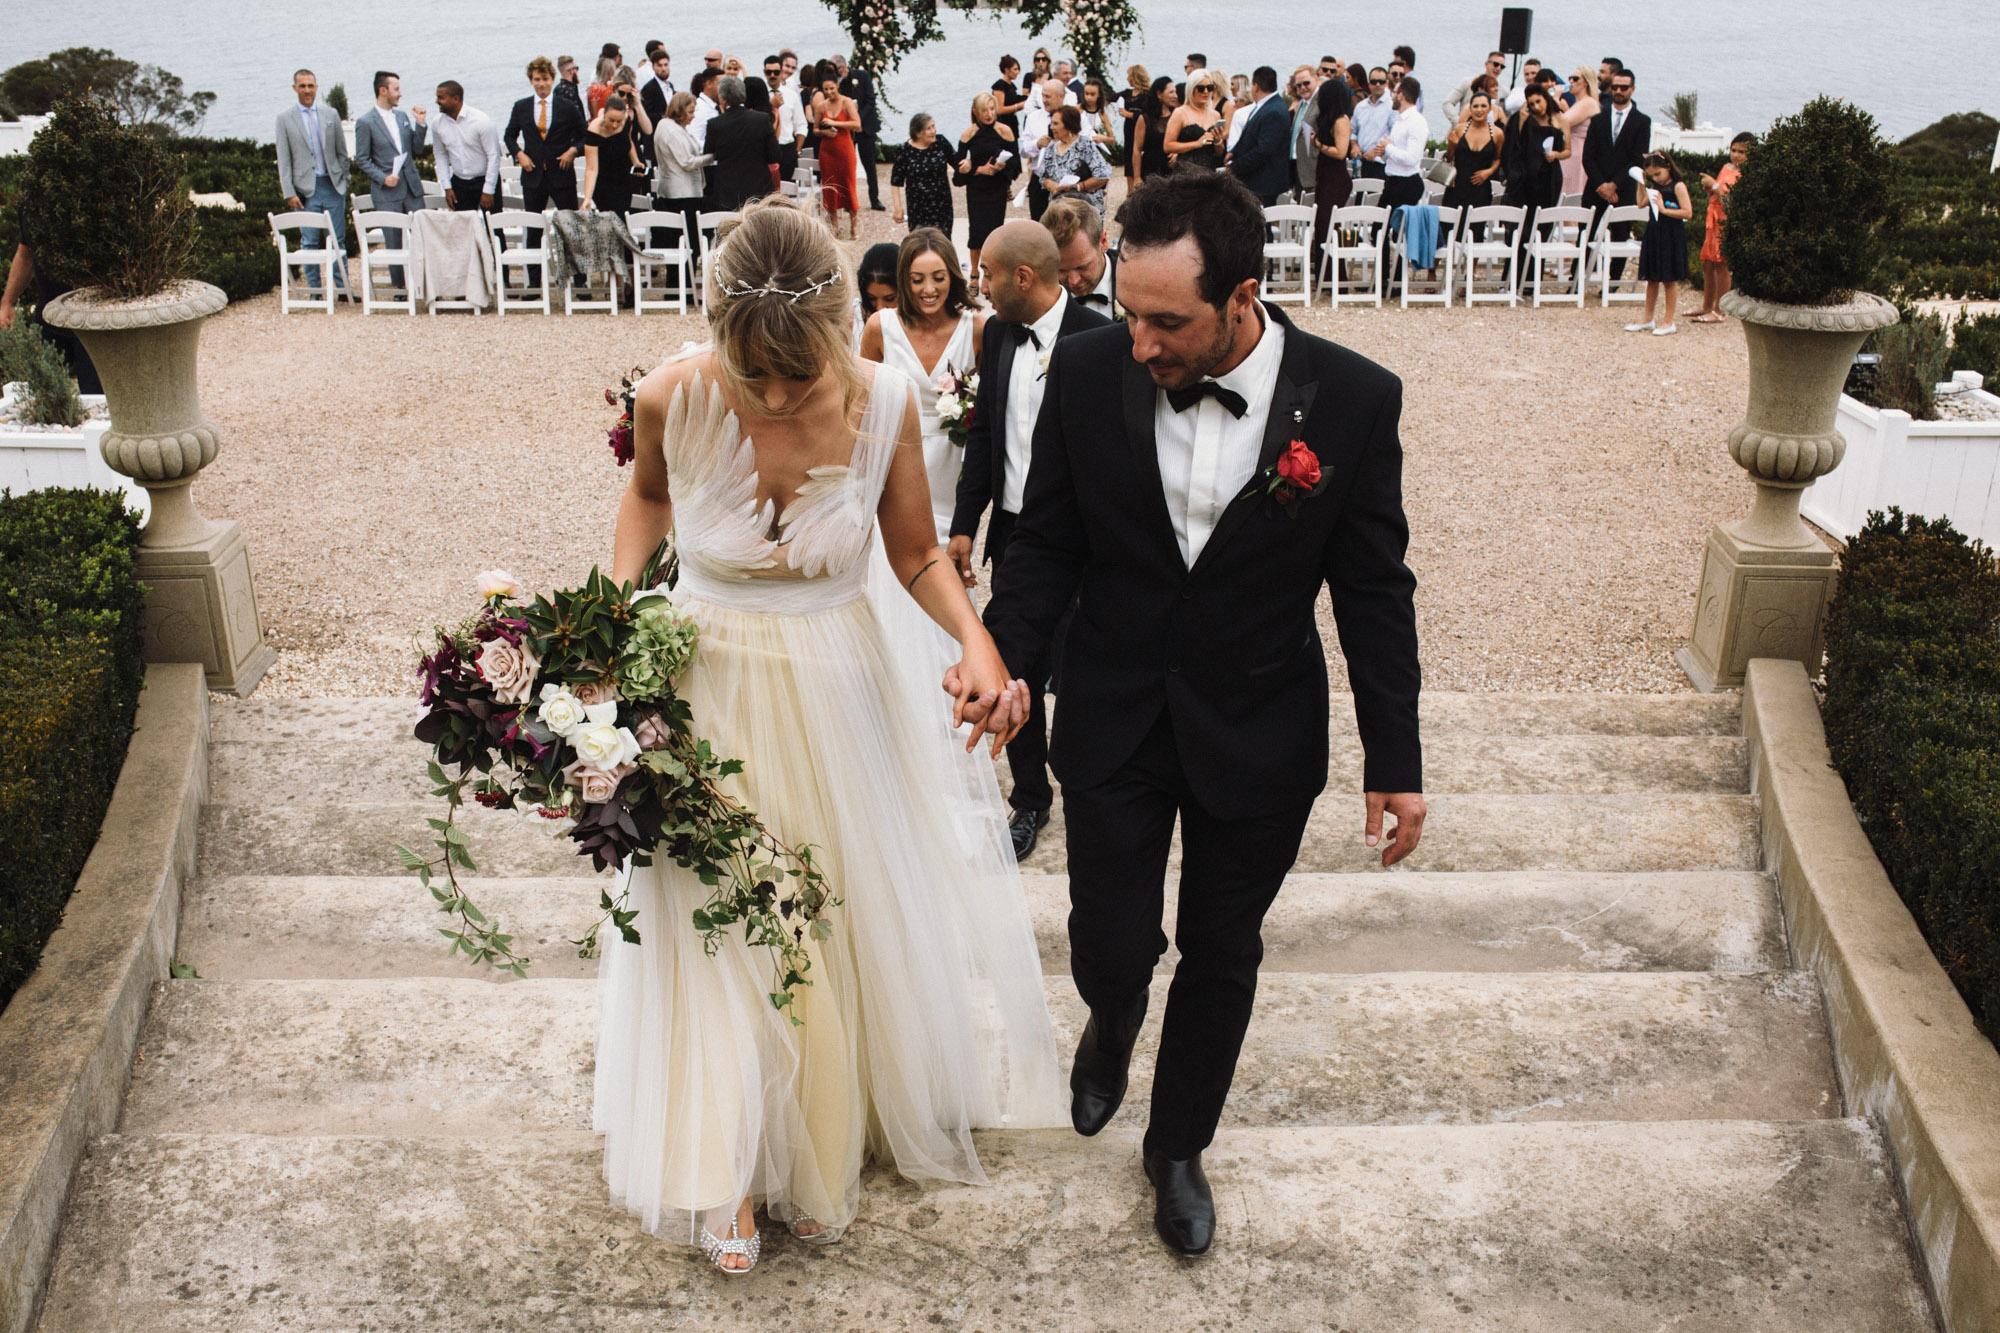 Campbell Point House Wedding HJ + Dean Raphael Weddings-83.jpg